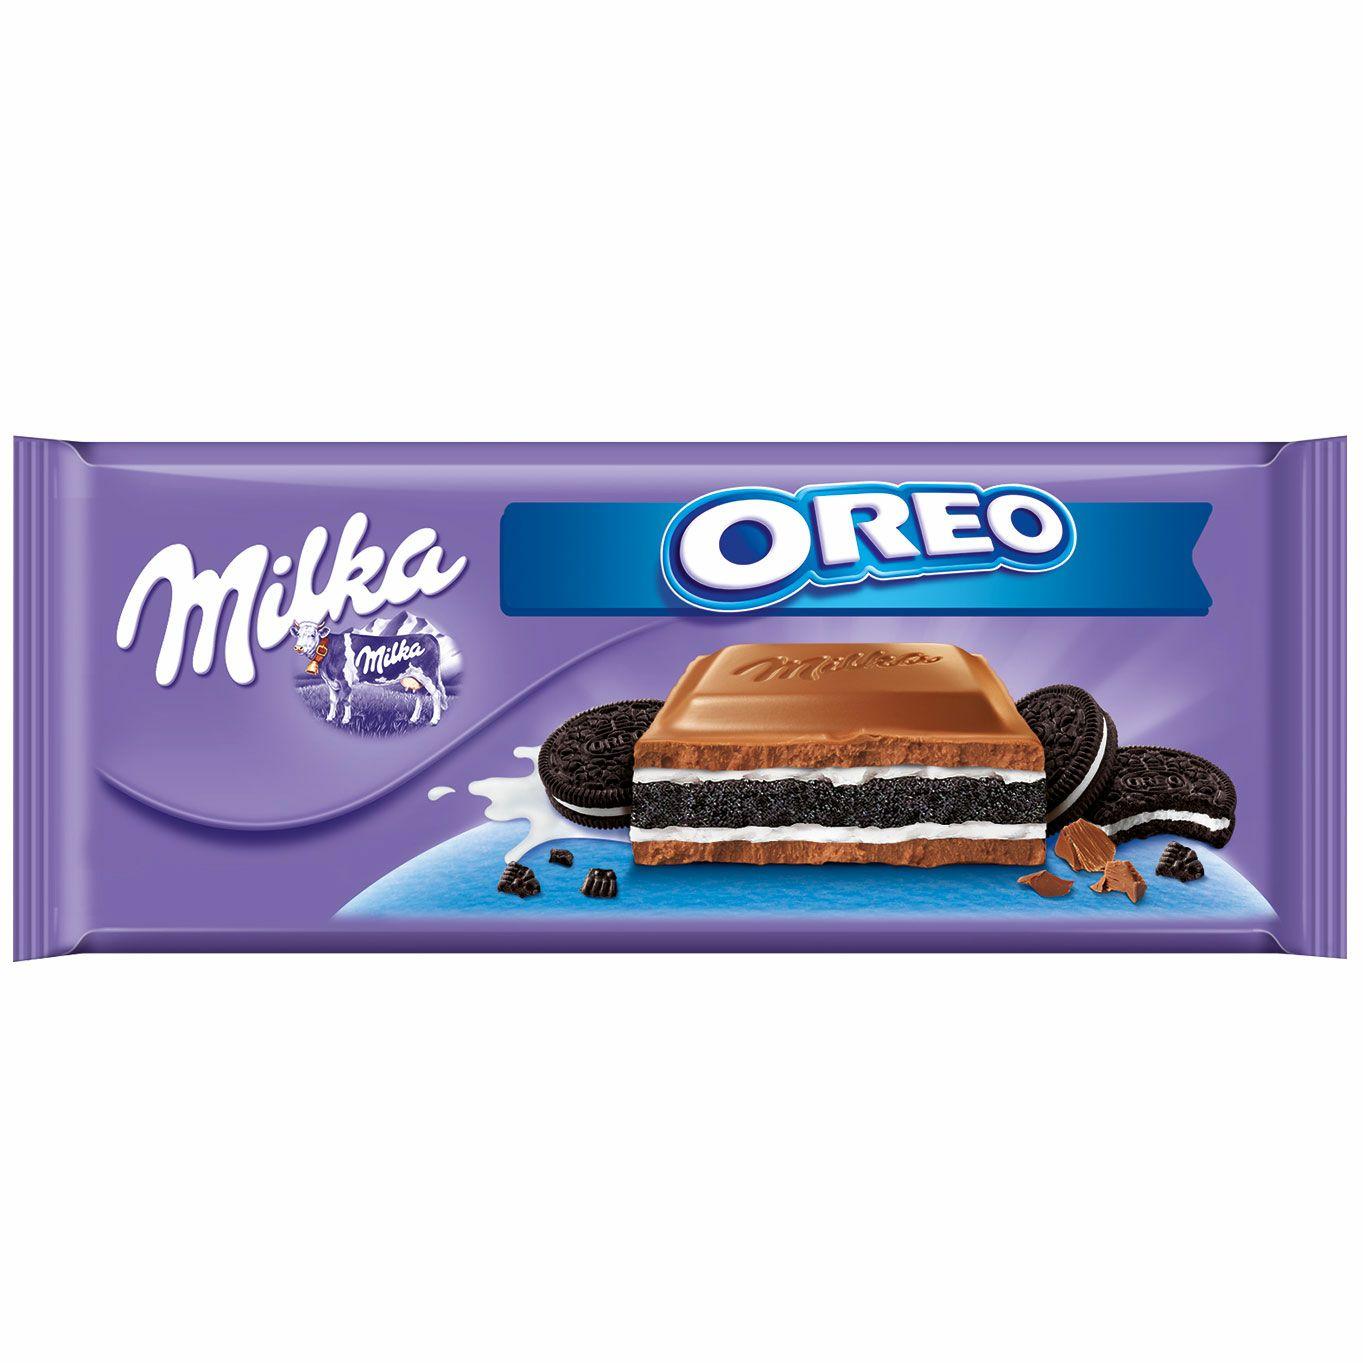 Milka oreo / choco & biscuit 300g £1.69 @ b&m bargains Small Heath